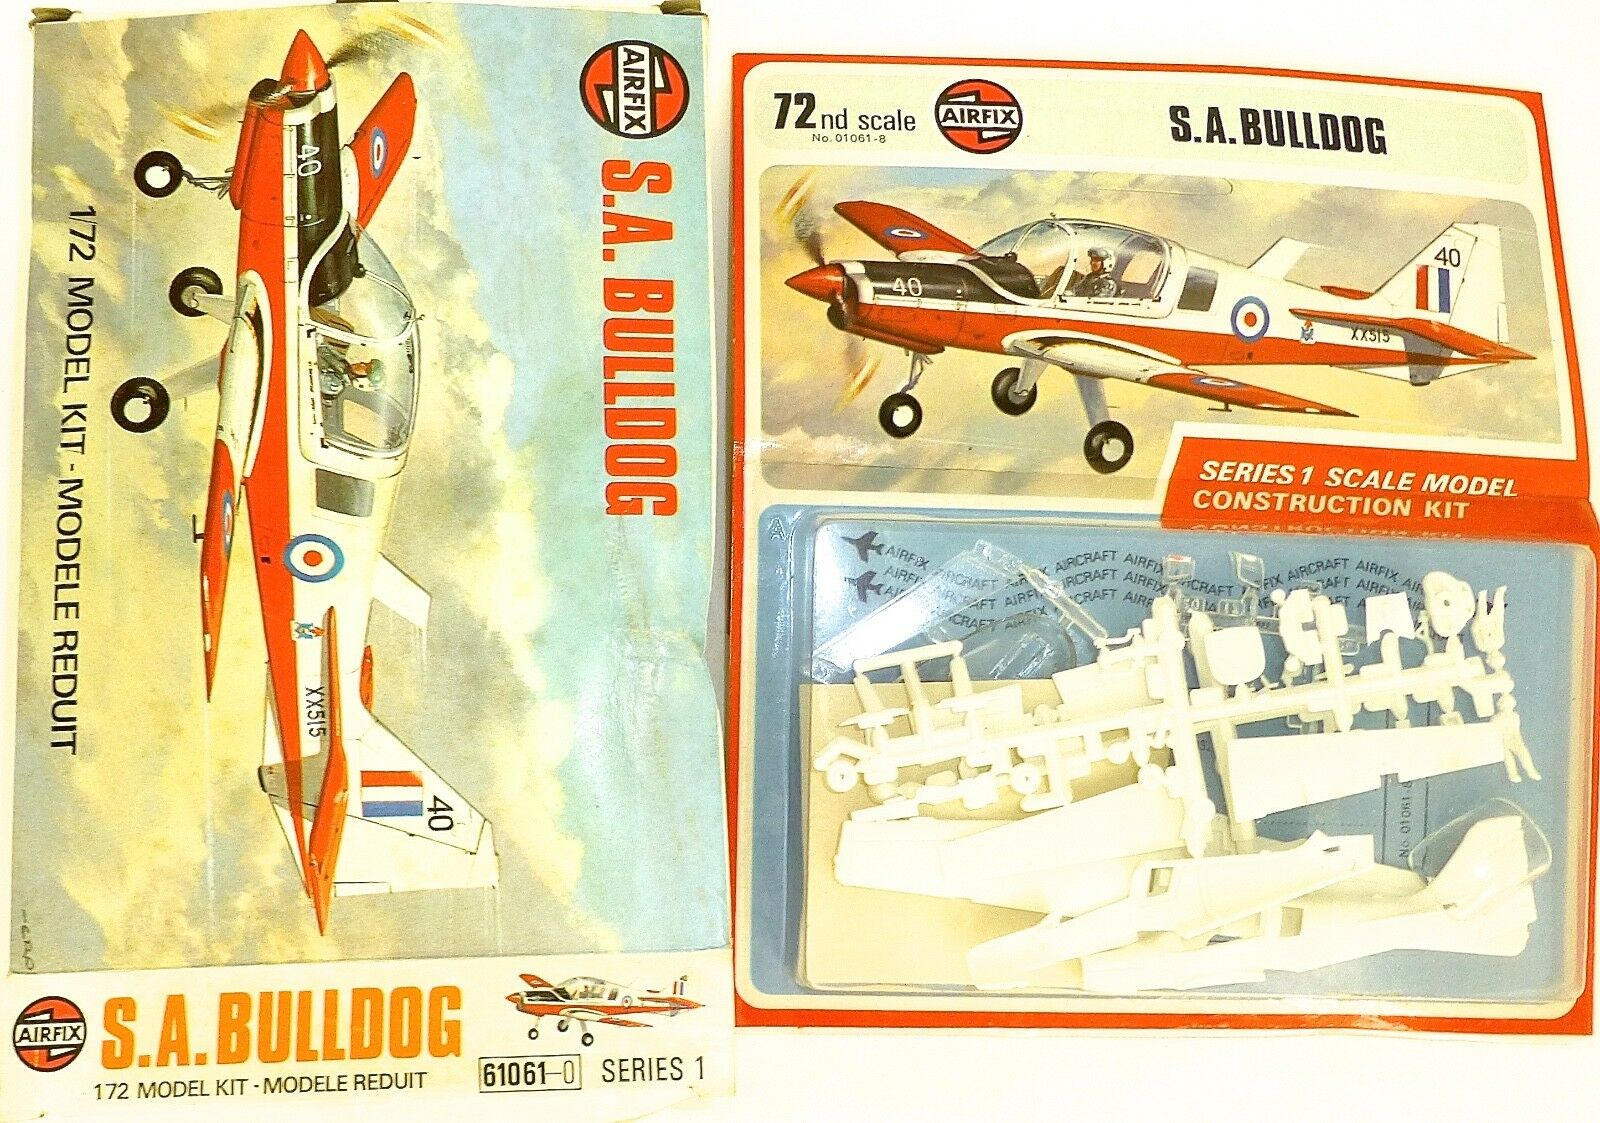 S.A.Bulldog Airfix 61061-0 Série 1 Modèle Kit 1 72 Emballage D'Origine Å